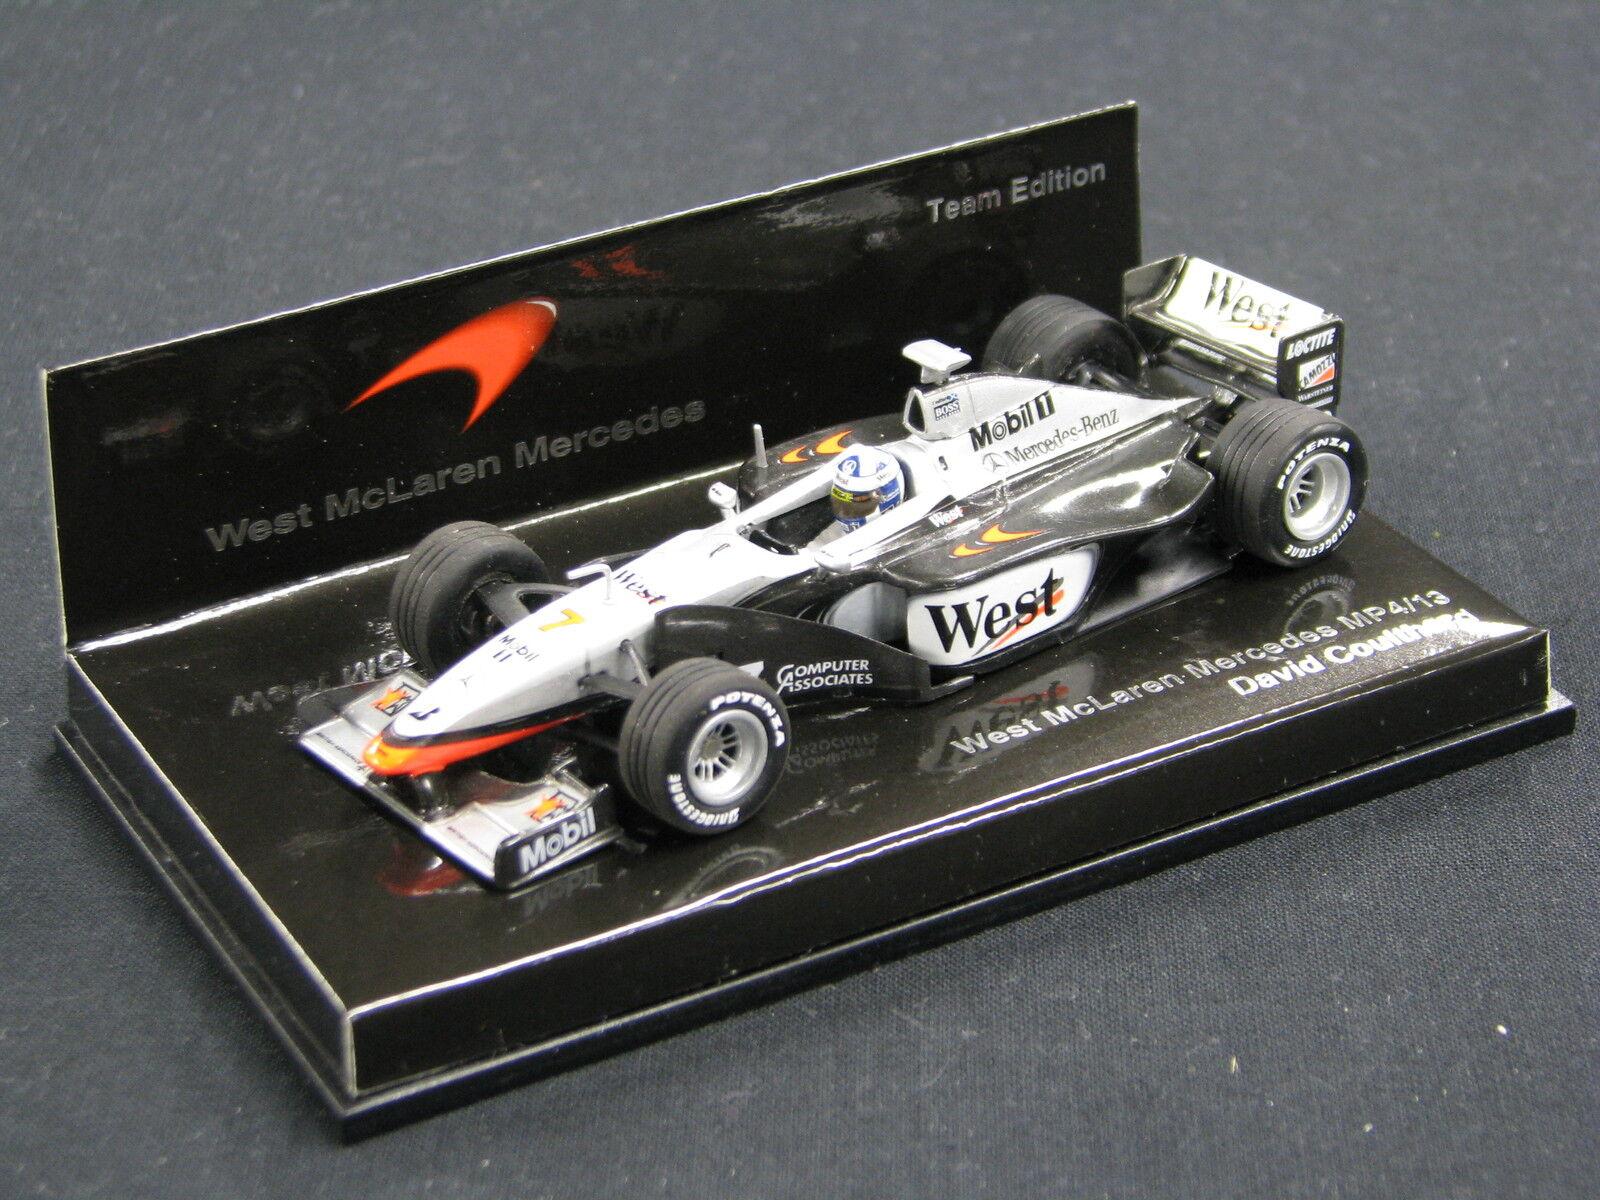 Minichamps West McLaren Mercedes MP4 13 1998 1 43  7 David Coulthard (GBR) (JS)